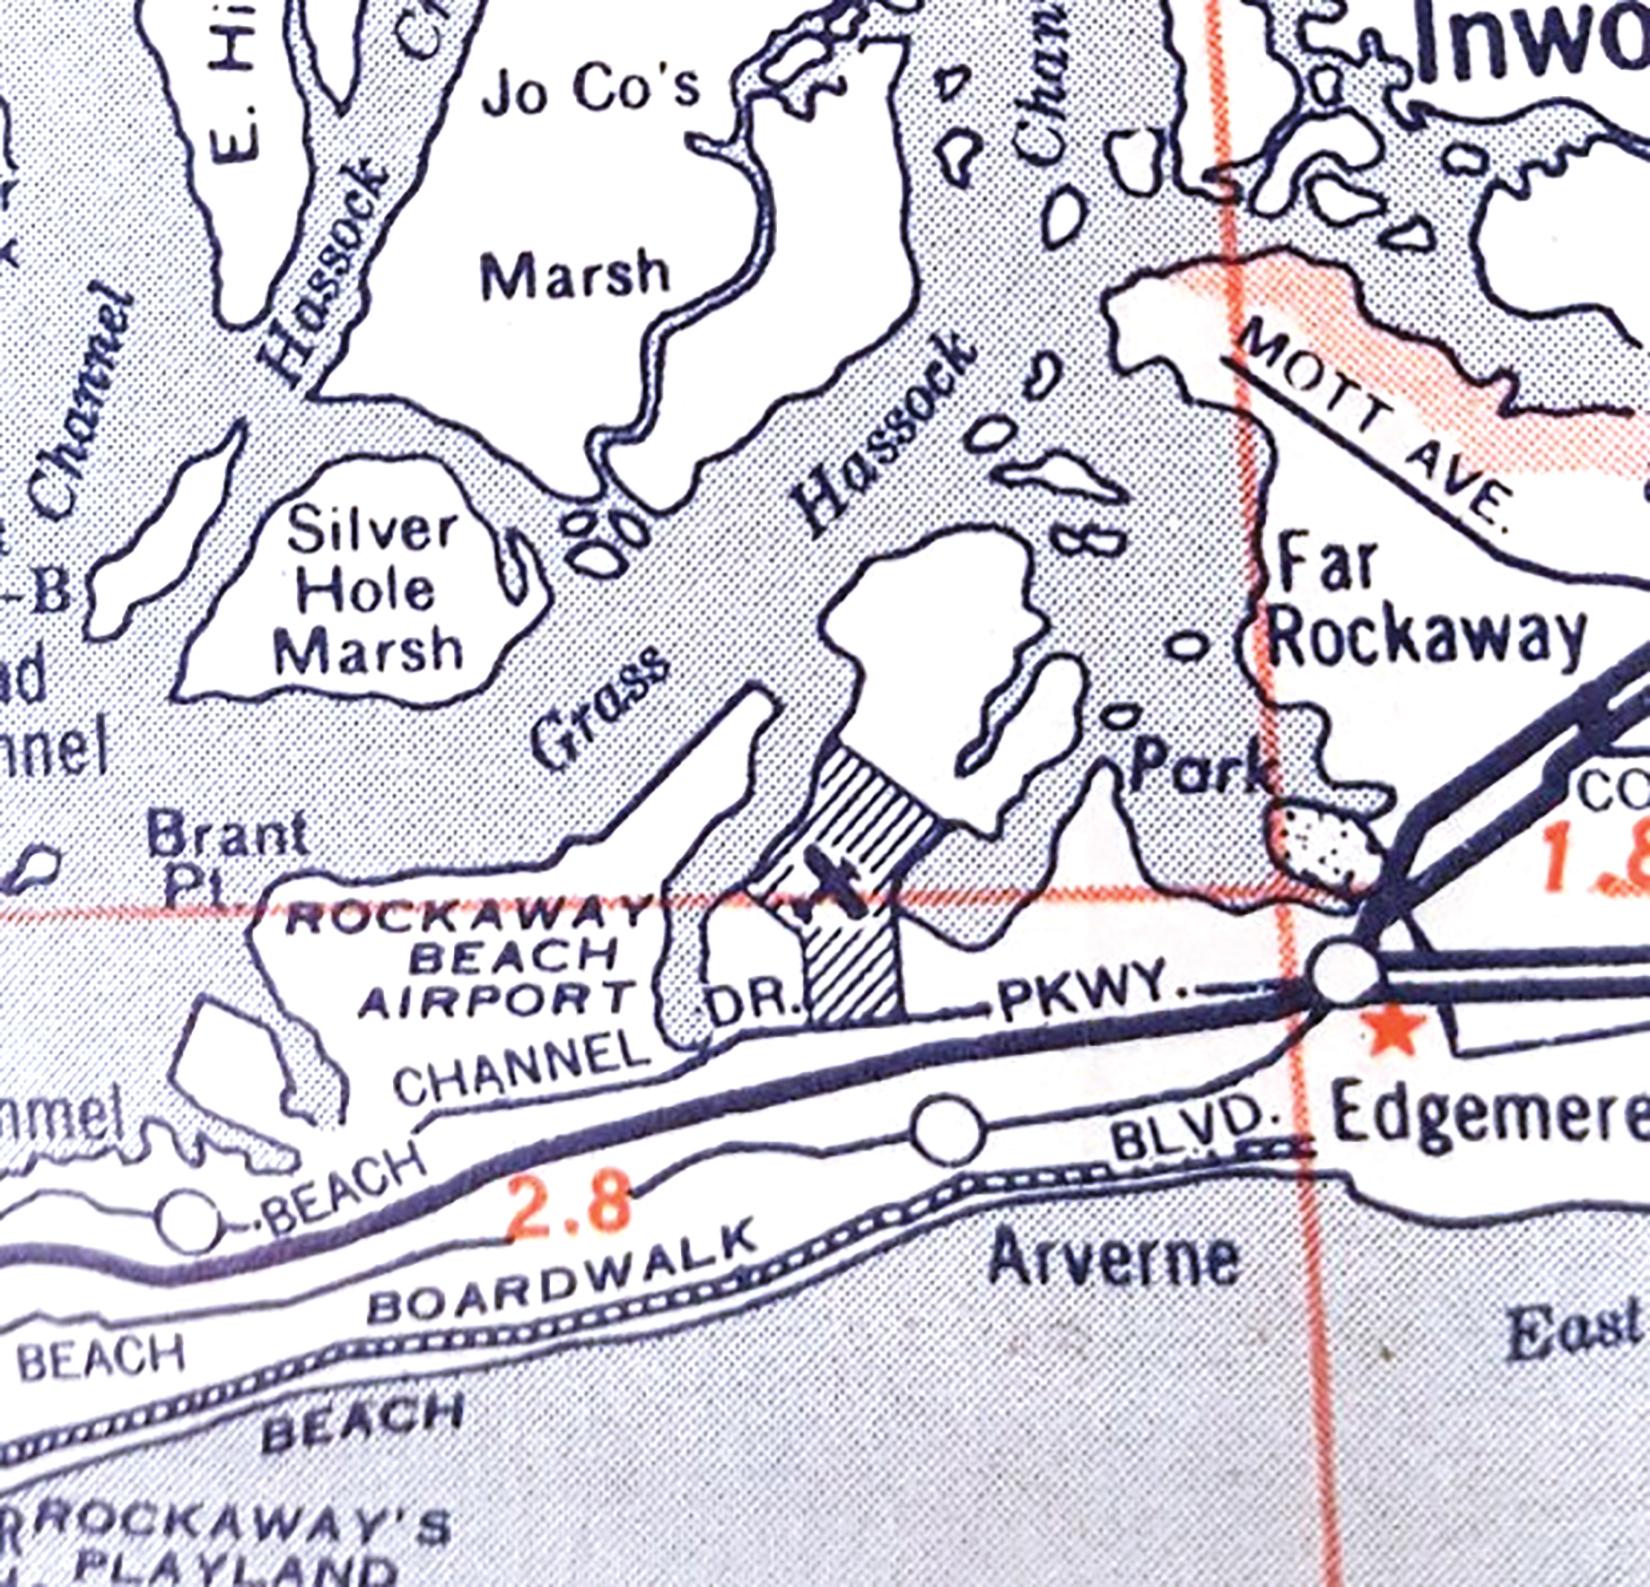 Rockaway Airport-New York-Map